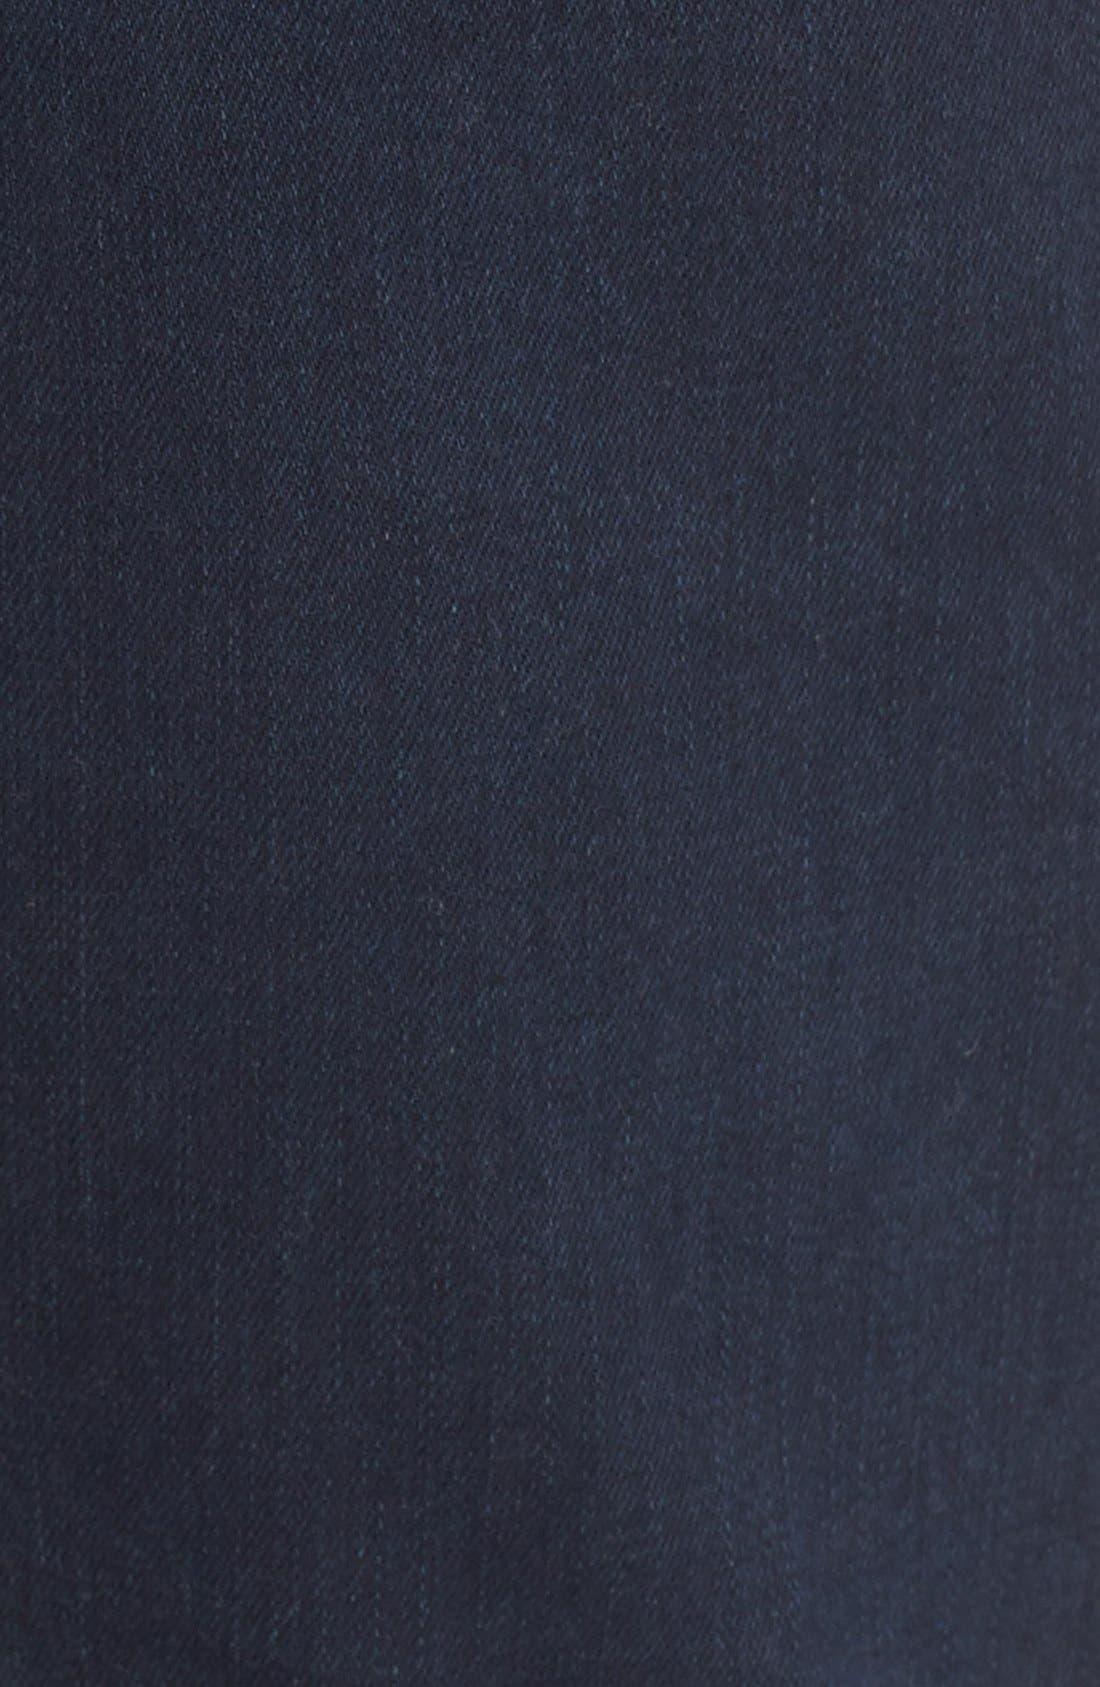 Straight Leg Jeans Jeans,                             Alternate thumbnail 5, color,                             Dark Indigo